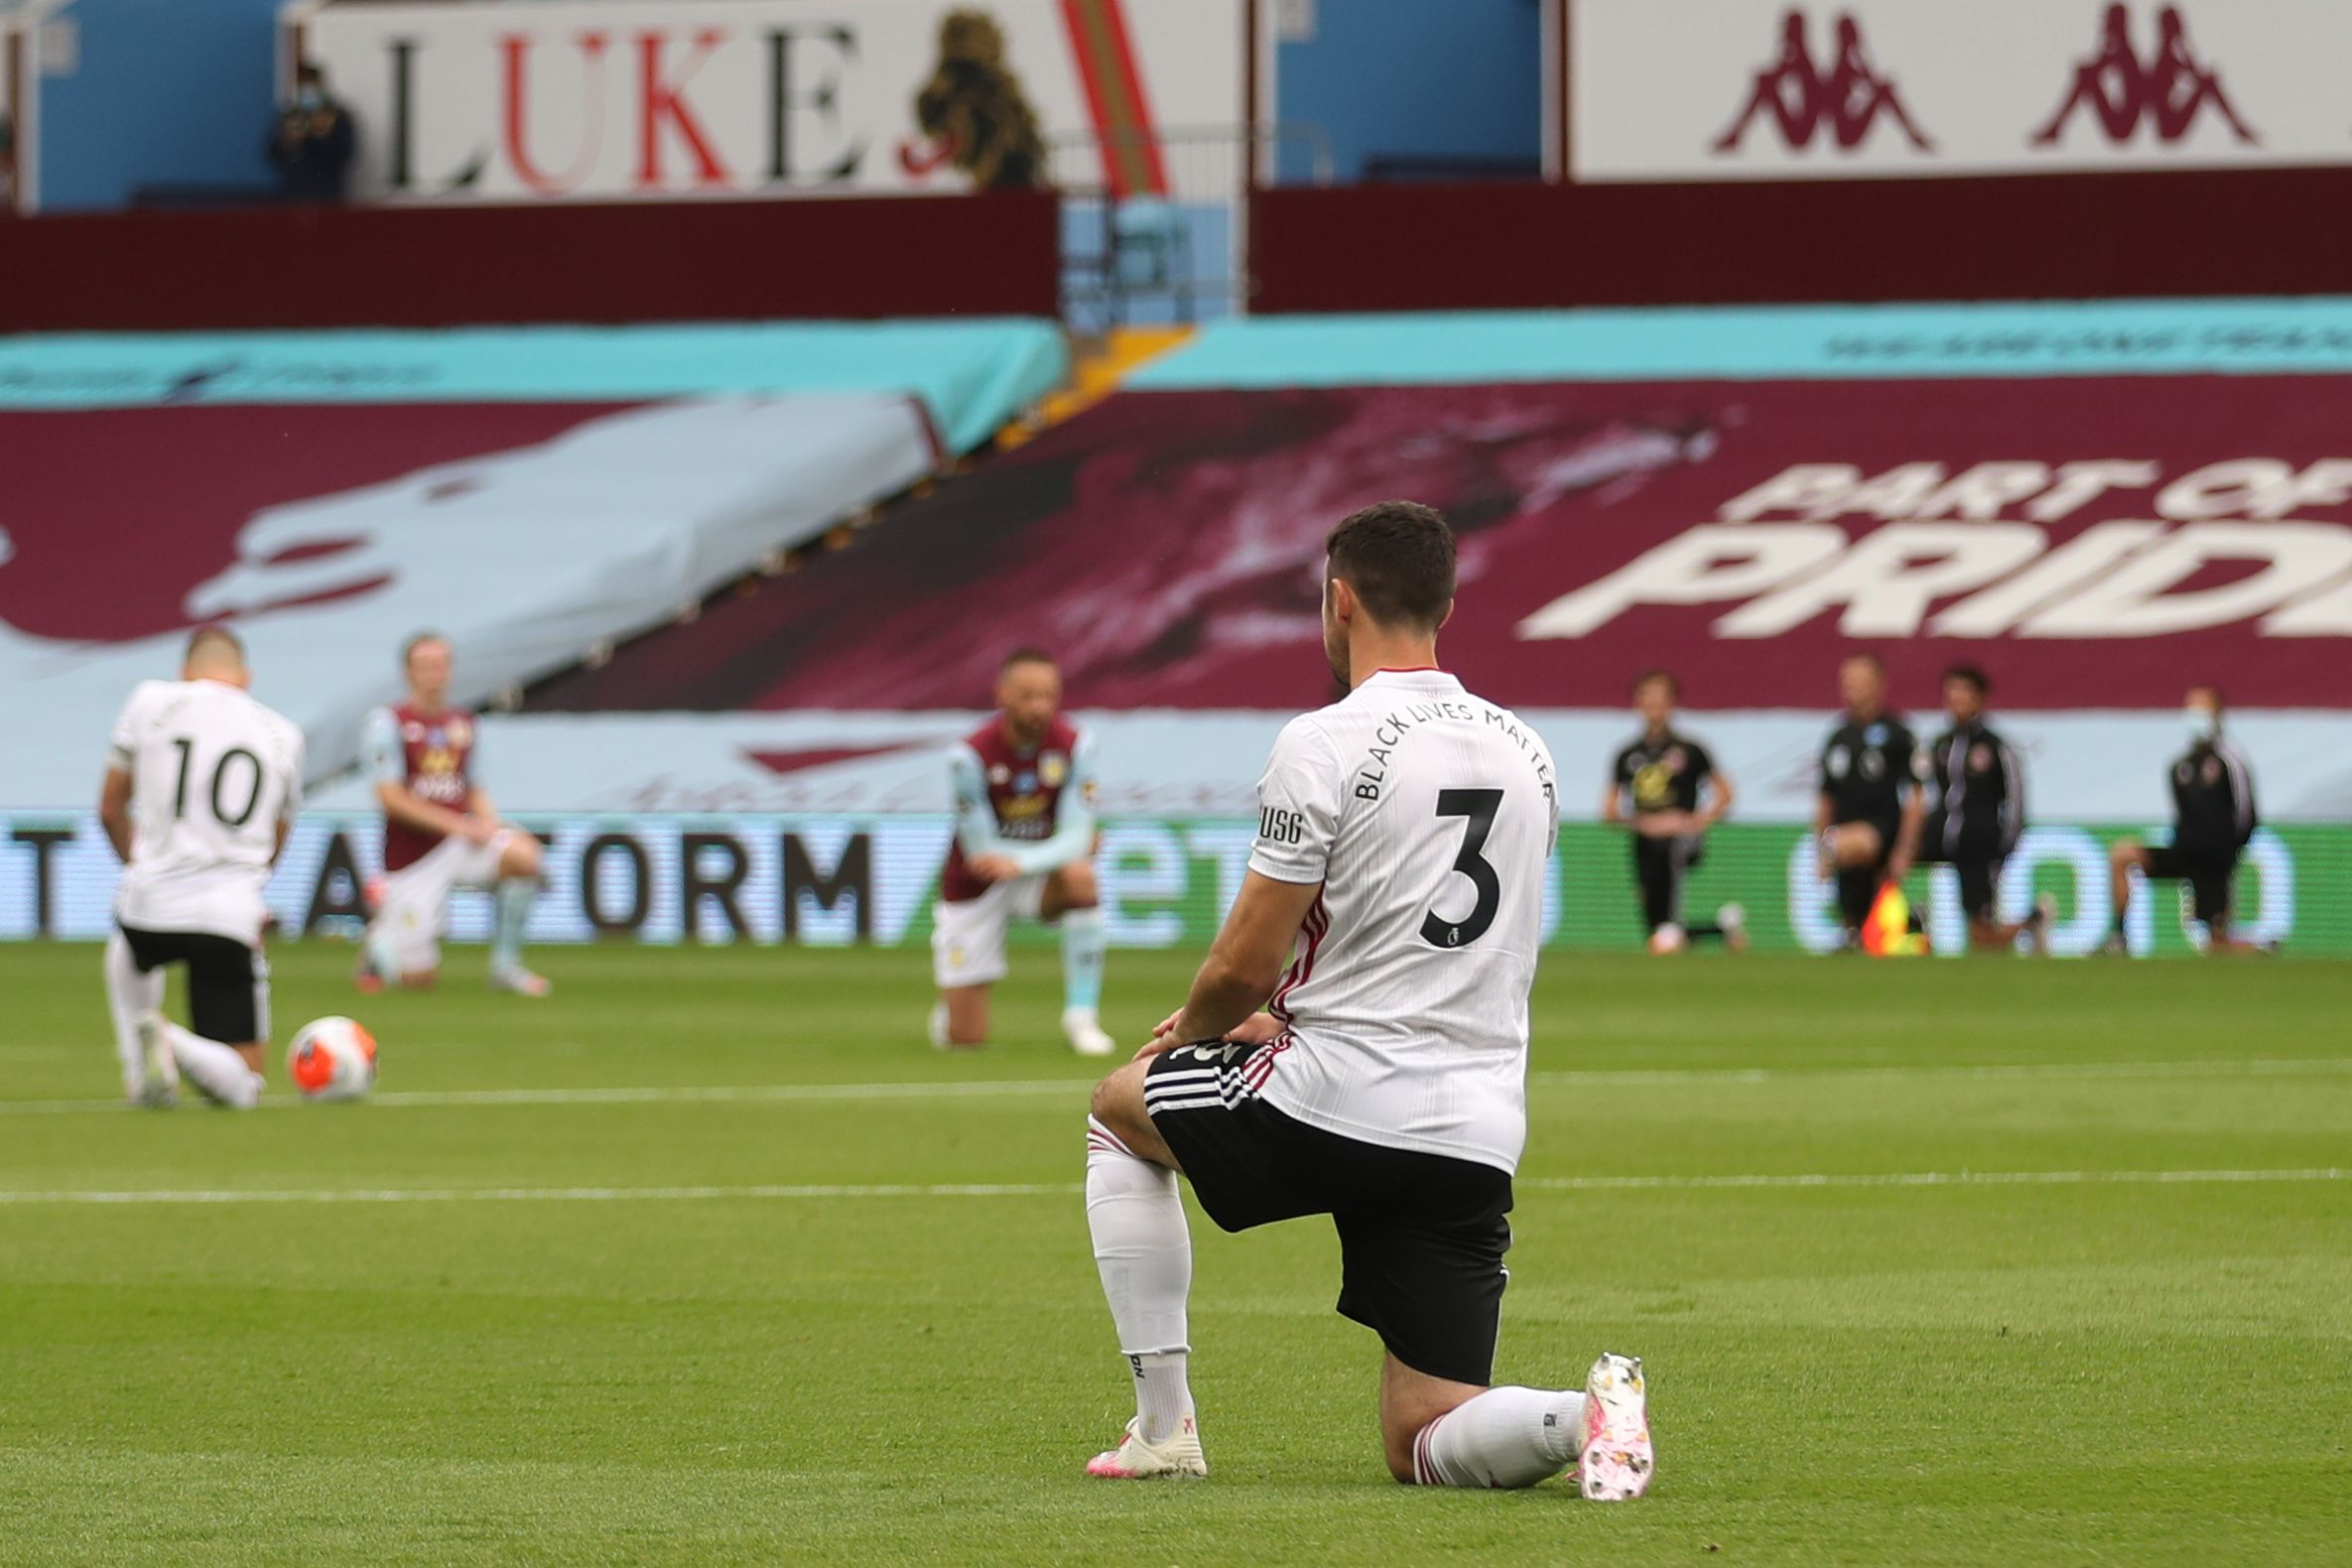 Sheffield United's Irish defender Enda Stevens kneels